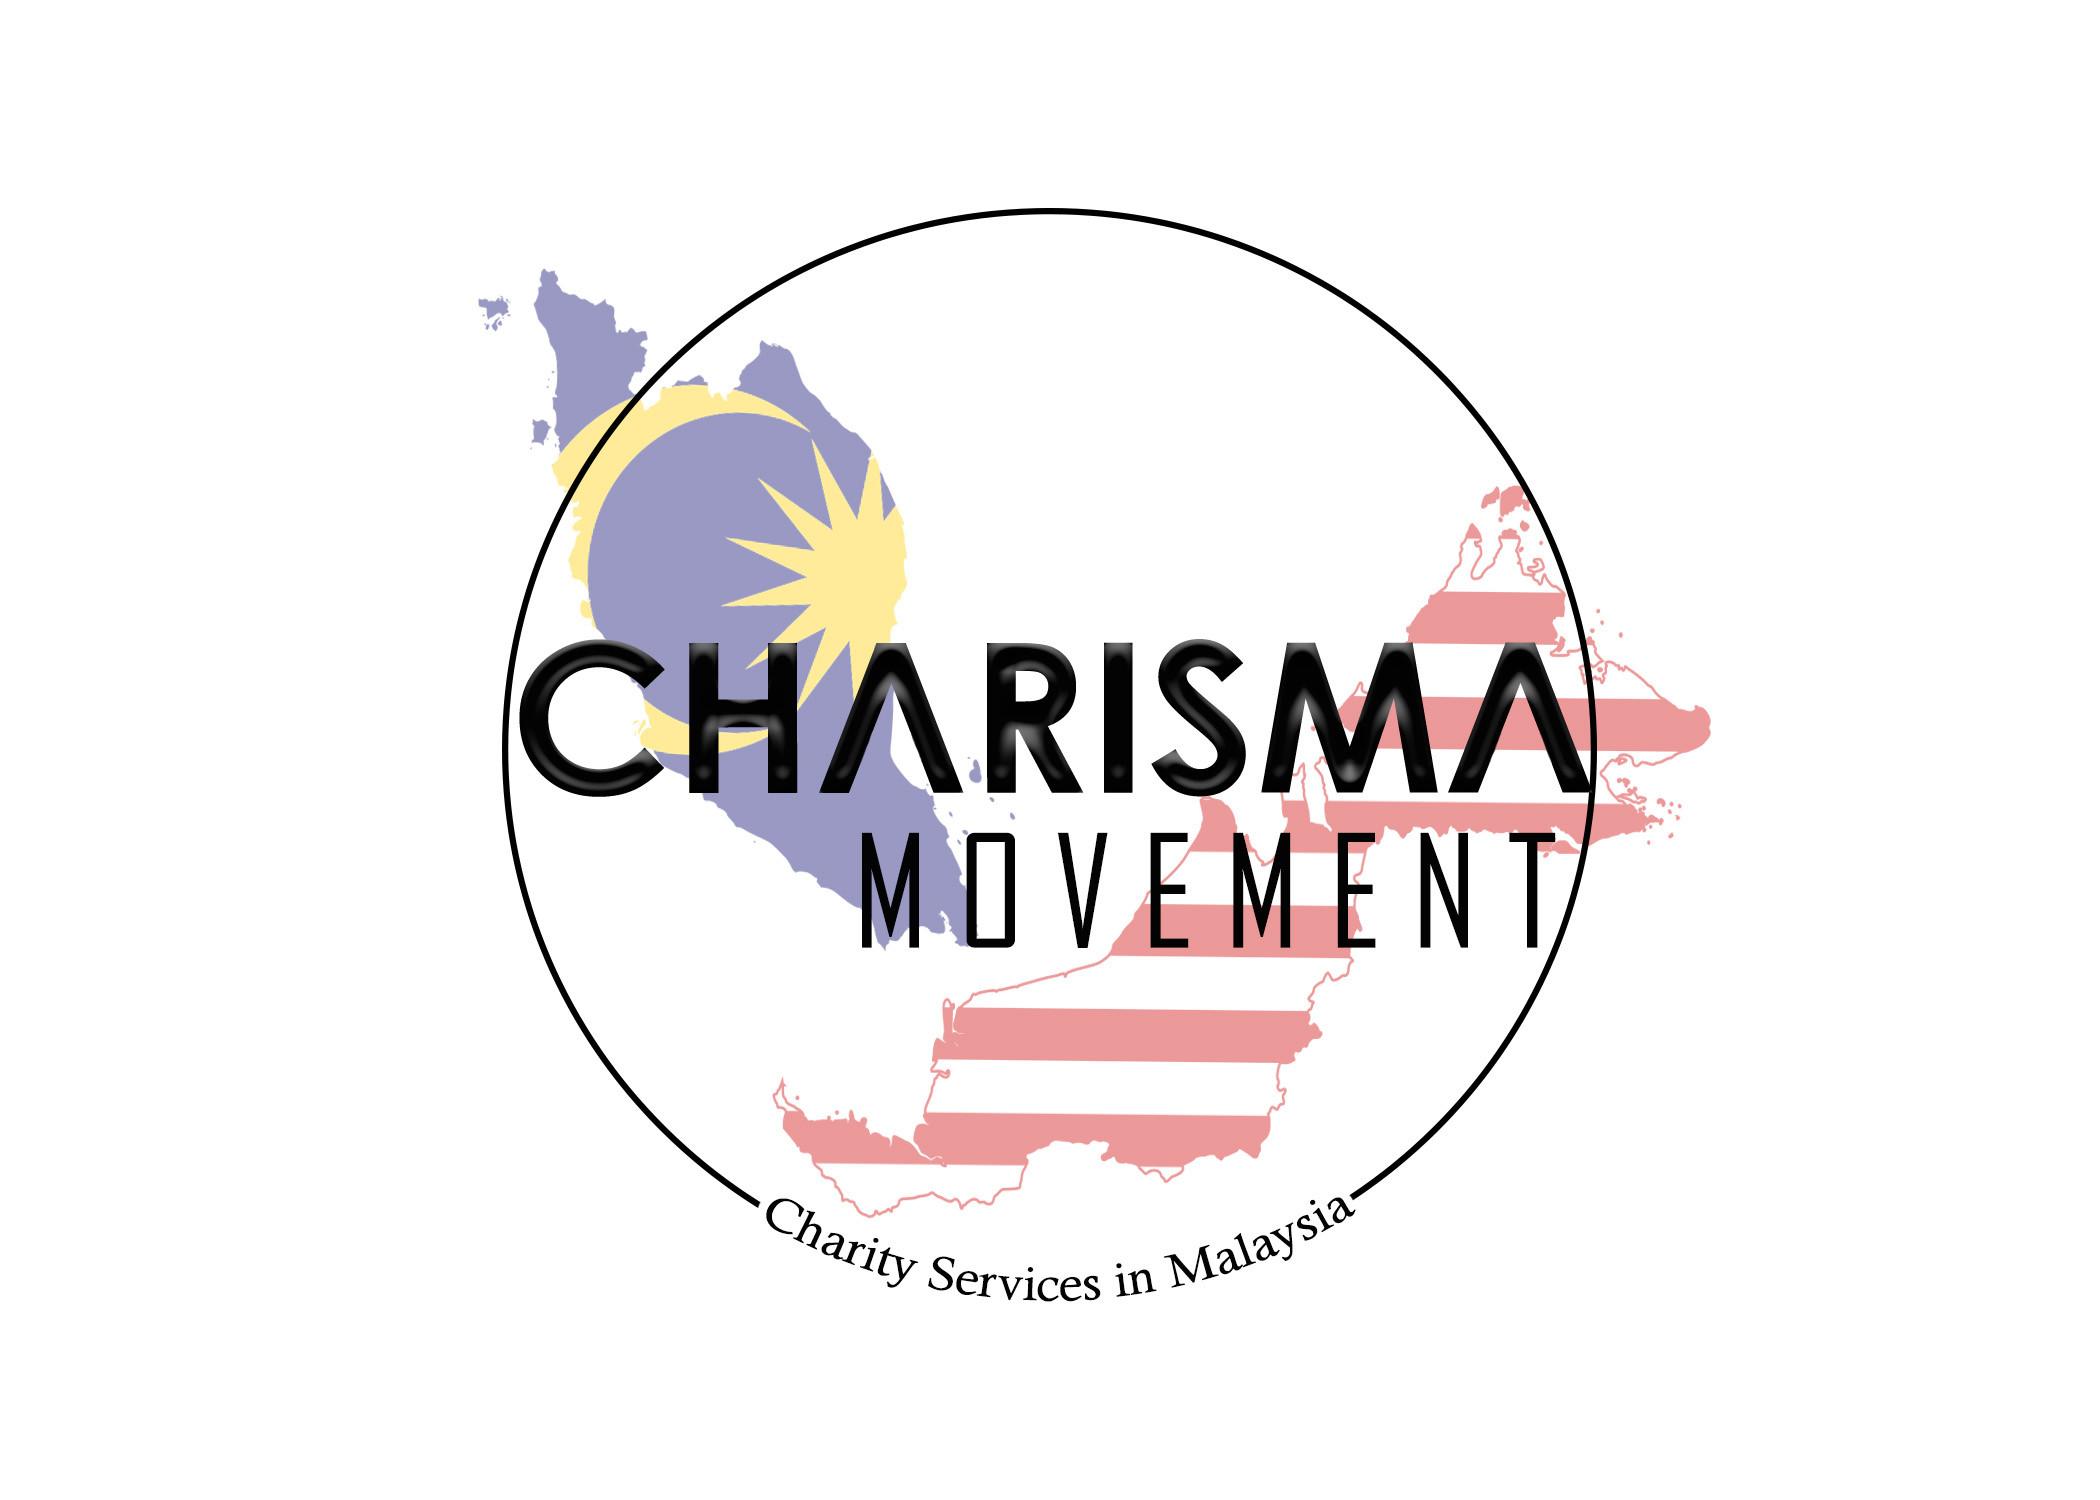 Charisma Movement